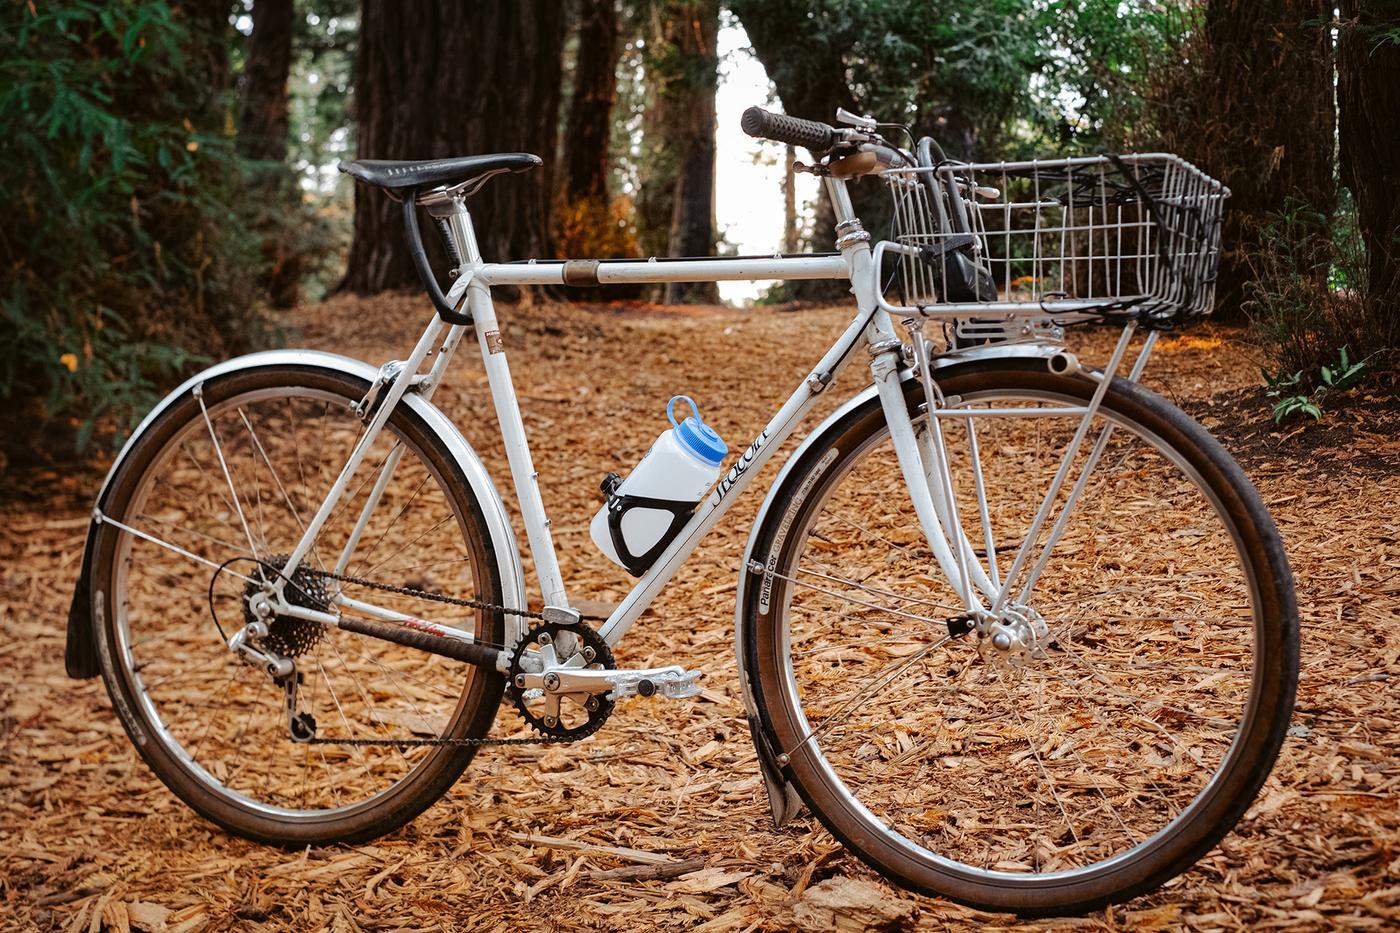 Readers' Rides: RJ Rabe's Sequoia Basket Bike Build